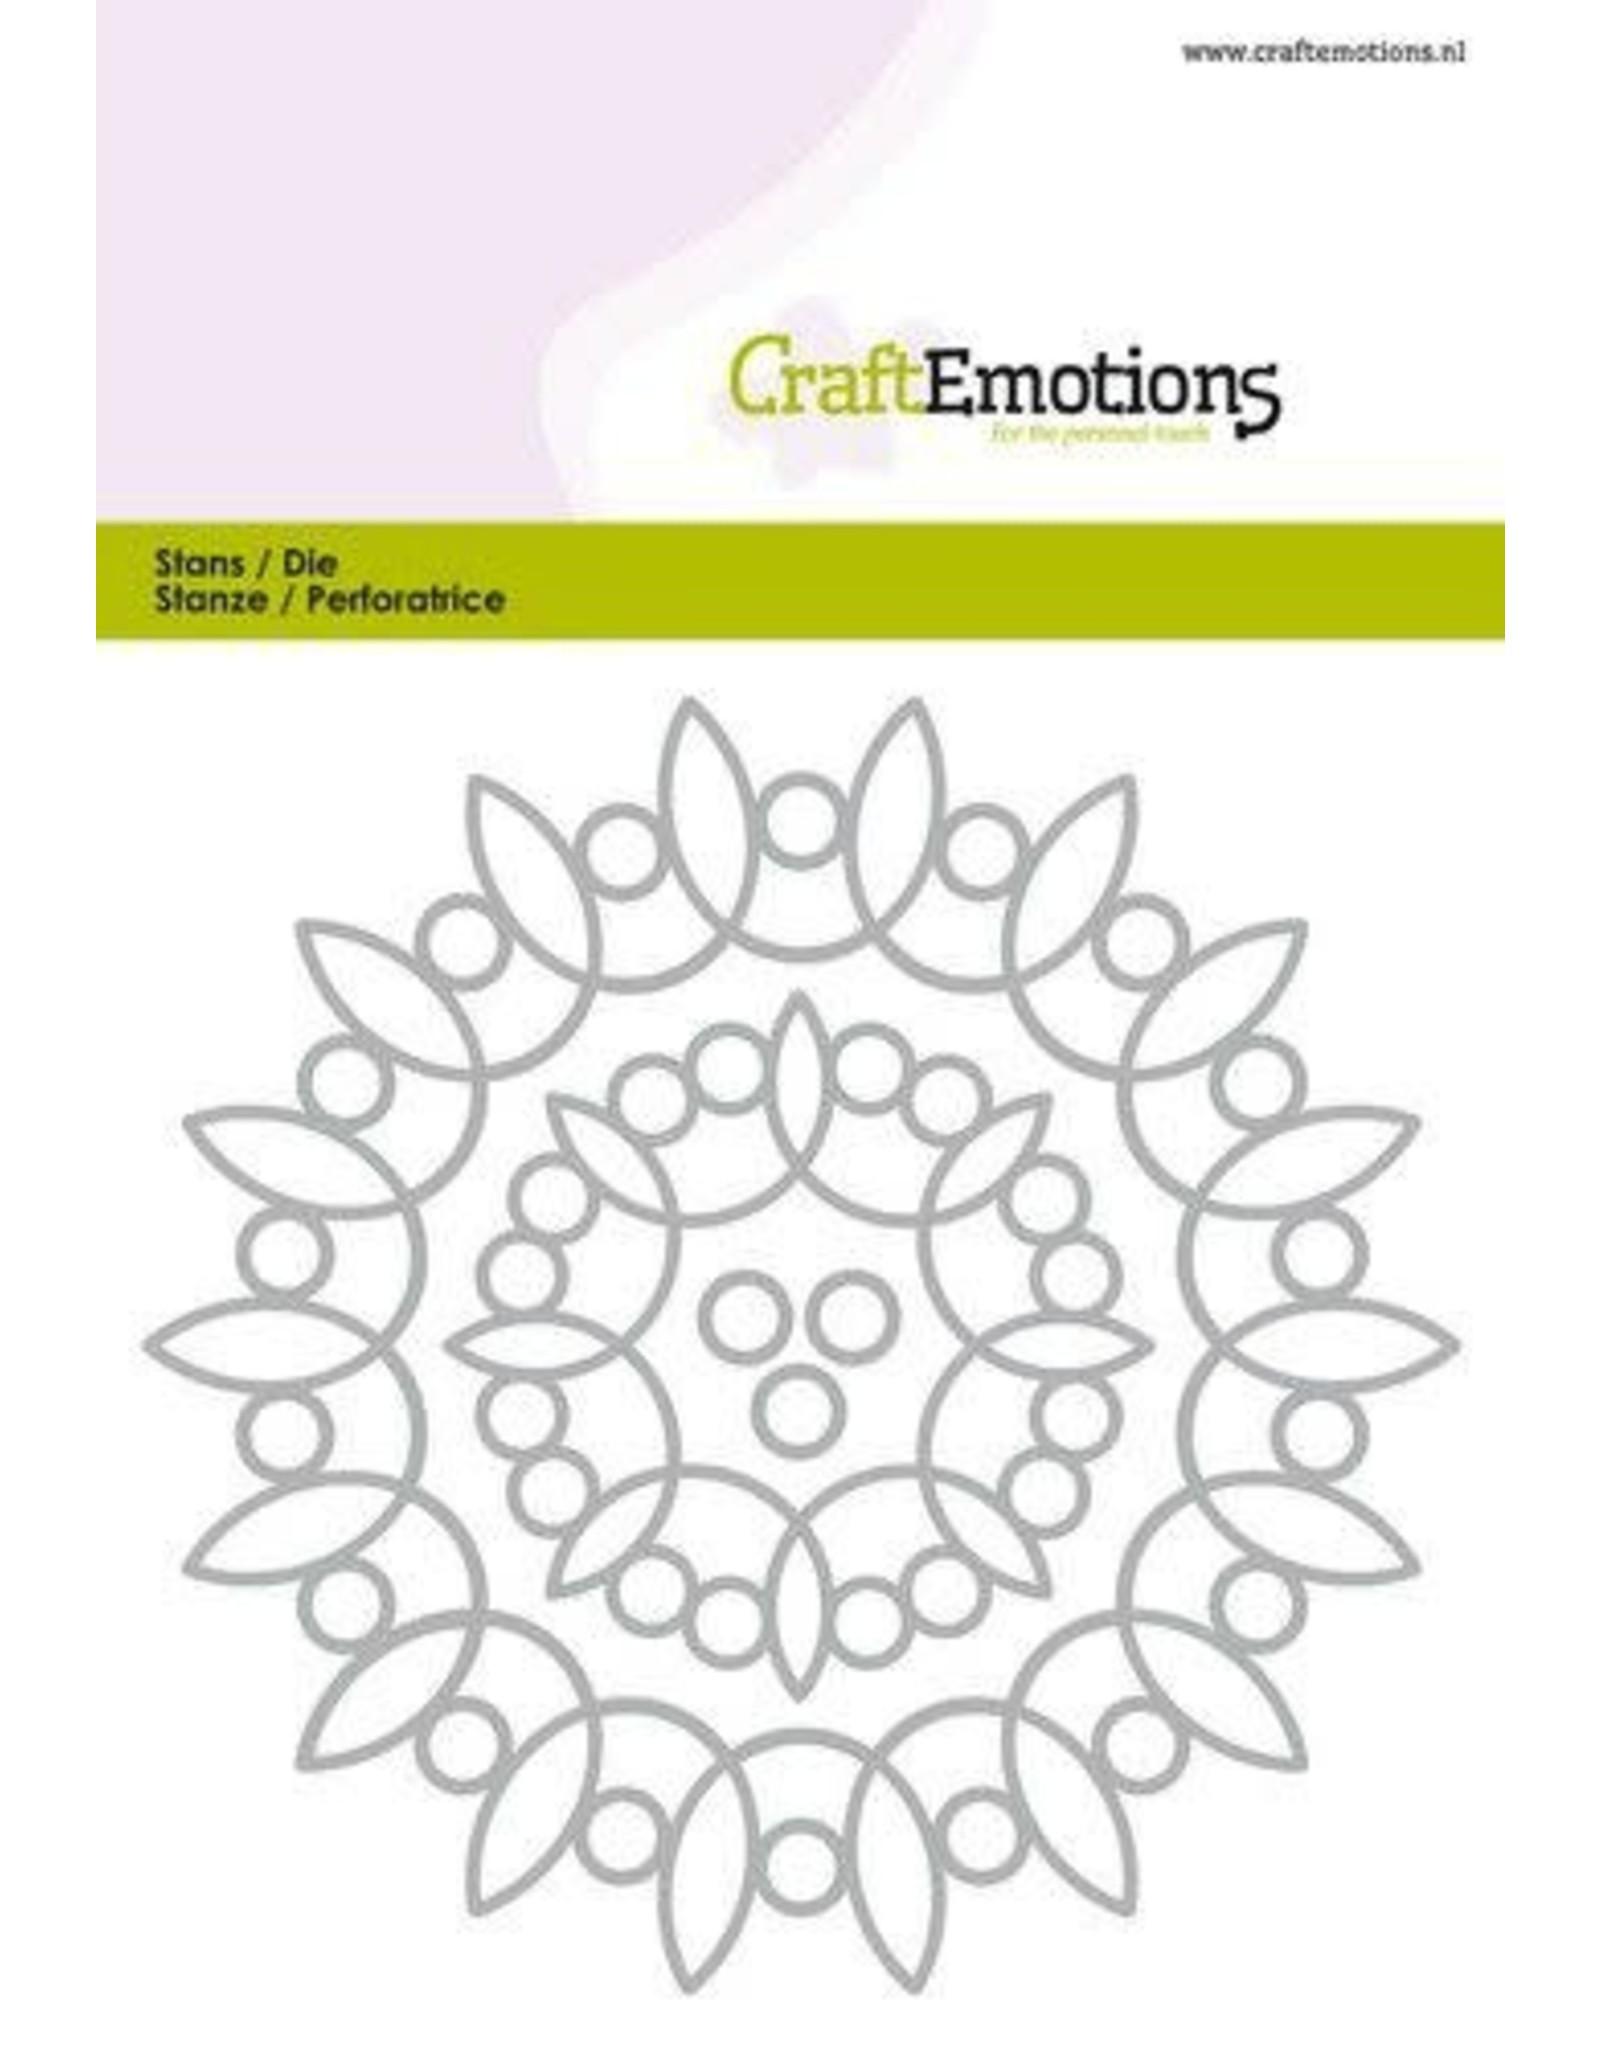 Craft Emotions CraftEmotions Die - frames art rond Card 10,5x14,8cm - 5,5cm - 10,5cm